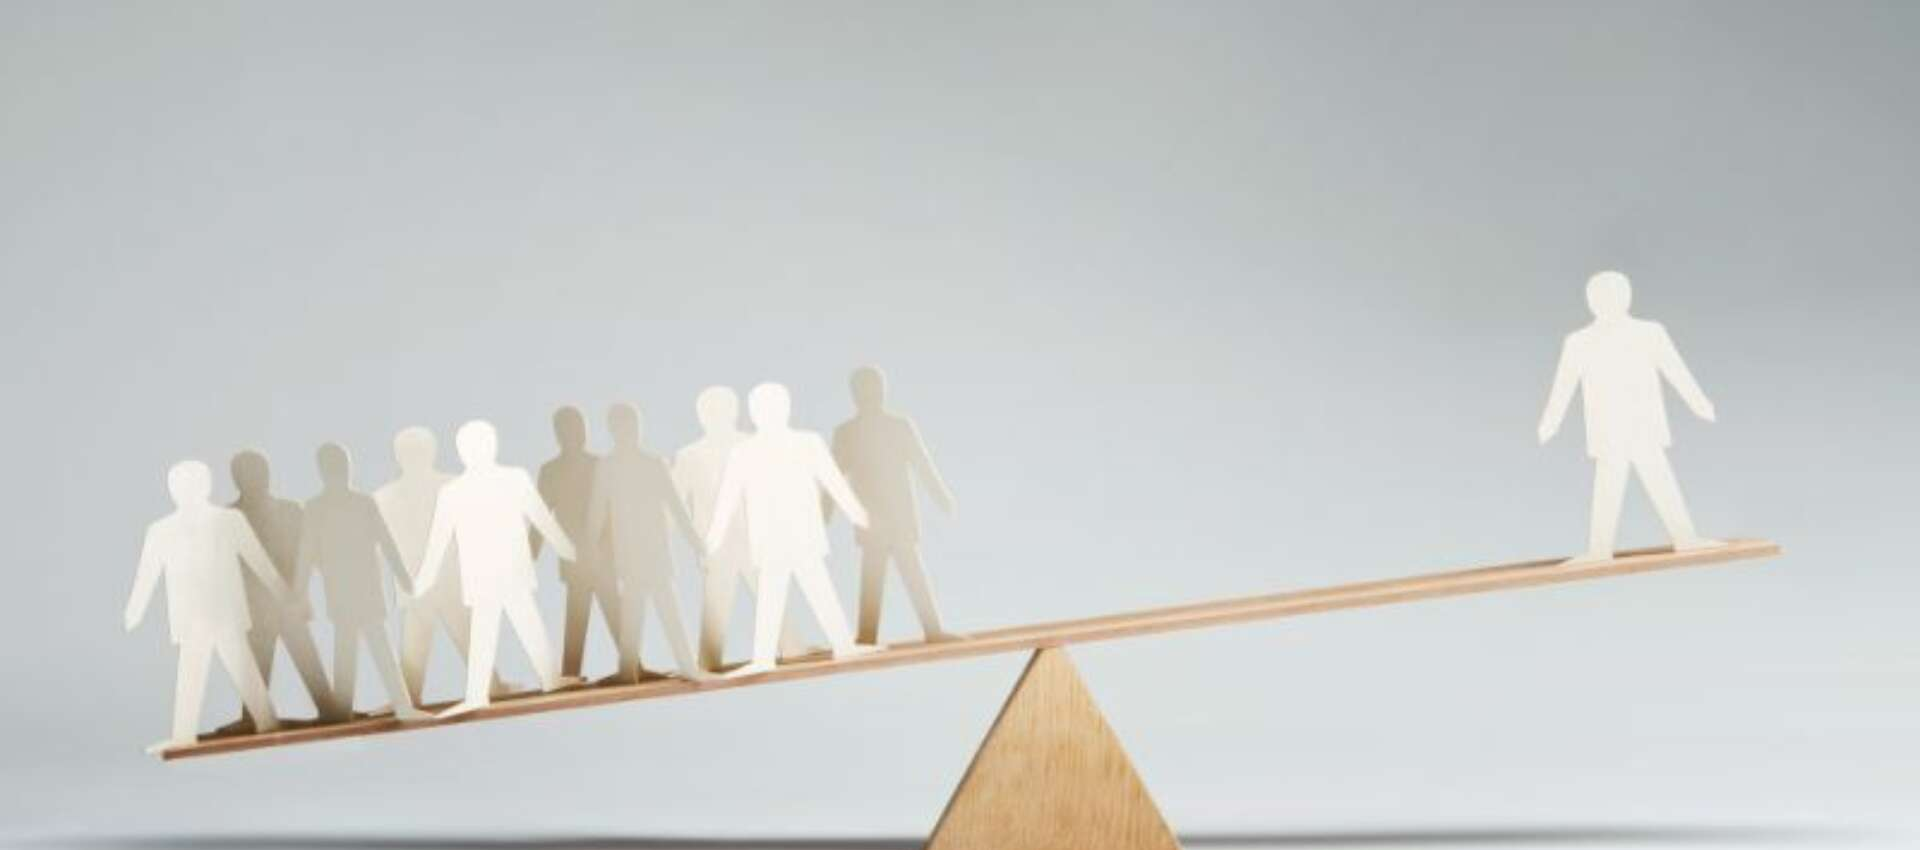 Stijgende werkgeverslasten in 2020?